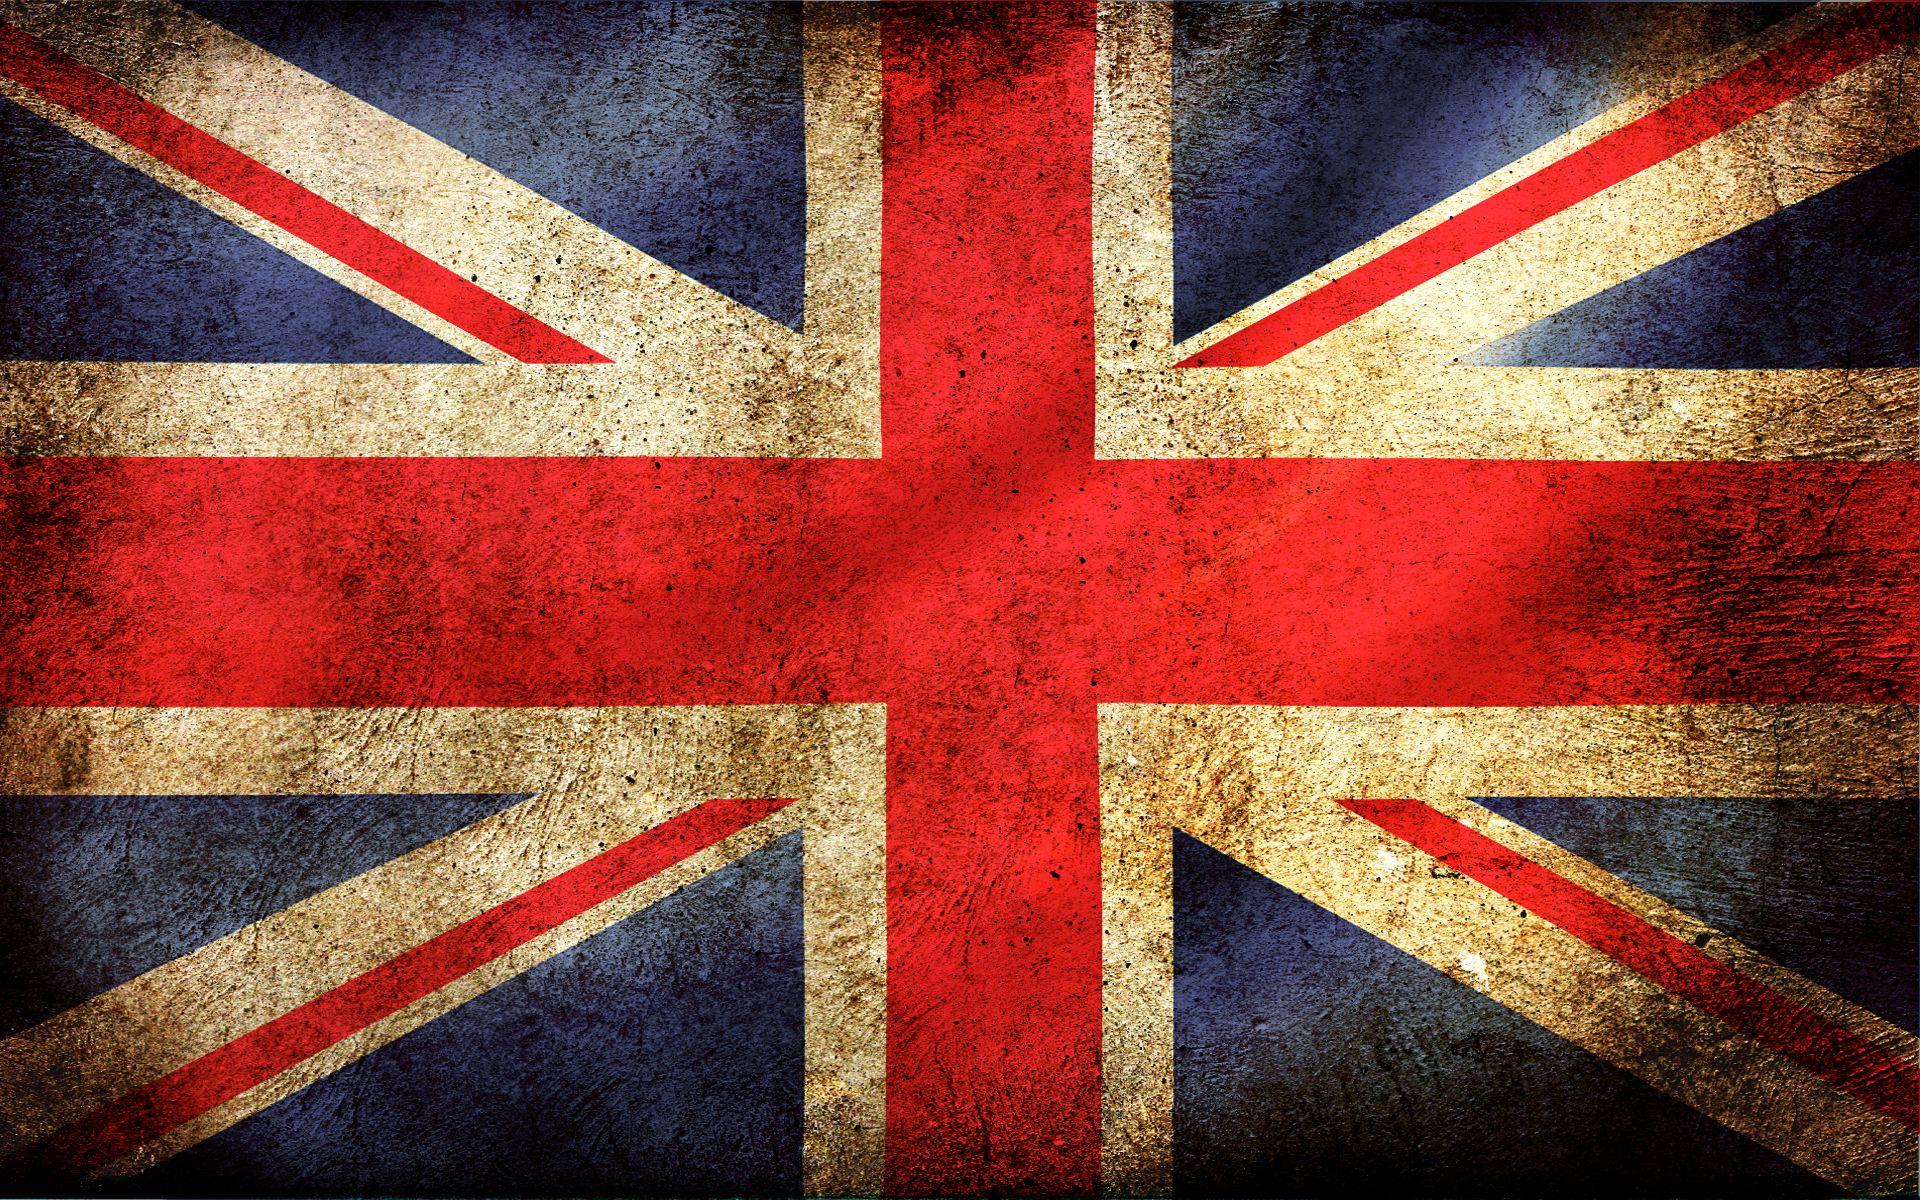 British flag wallpaper hd httpimashonwbritish flag british flag wallpaper hd httpimashonwbritish voltagebd Gallery